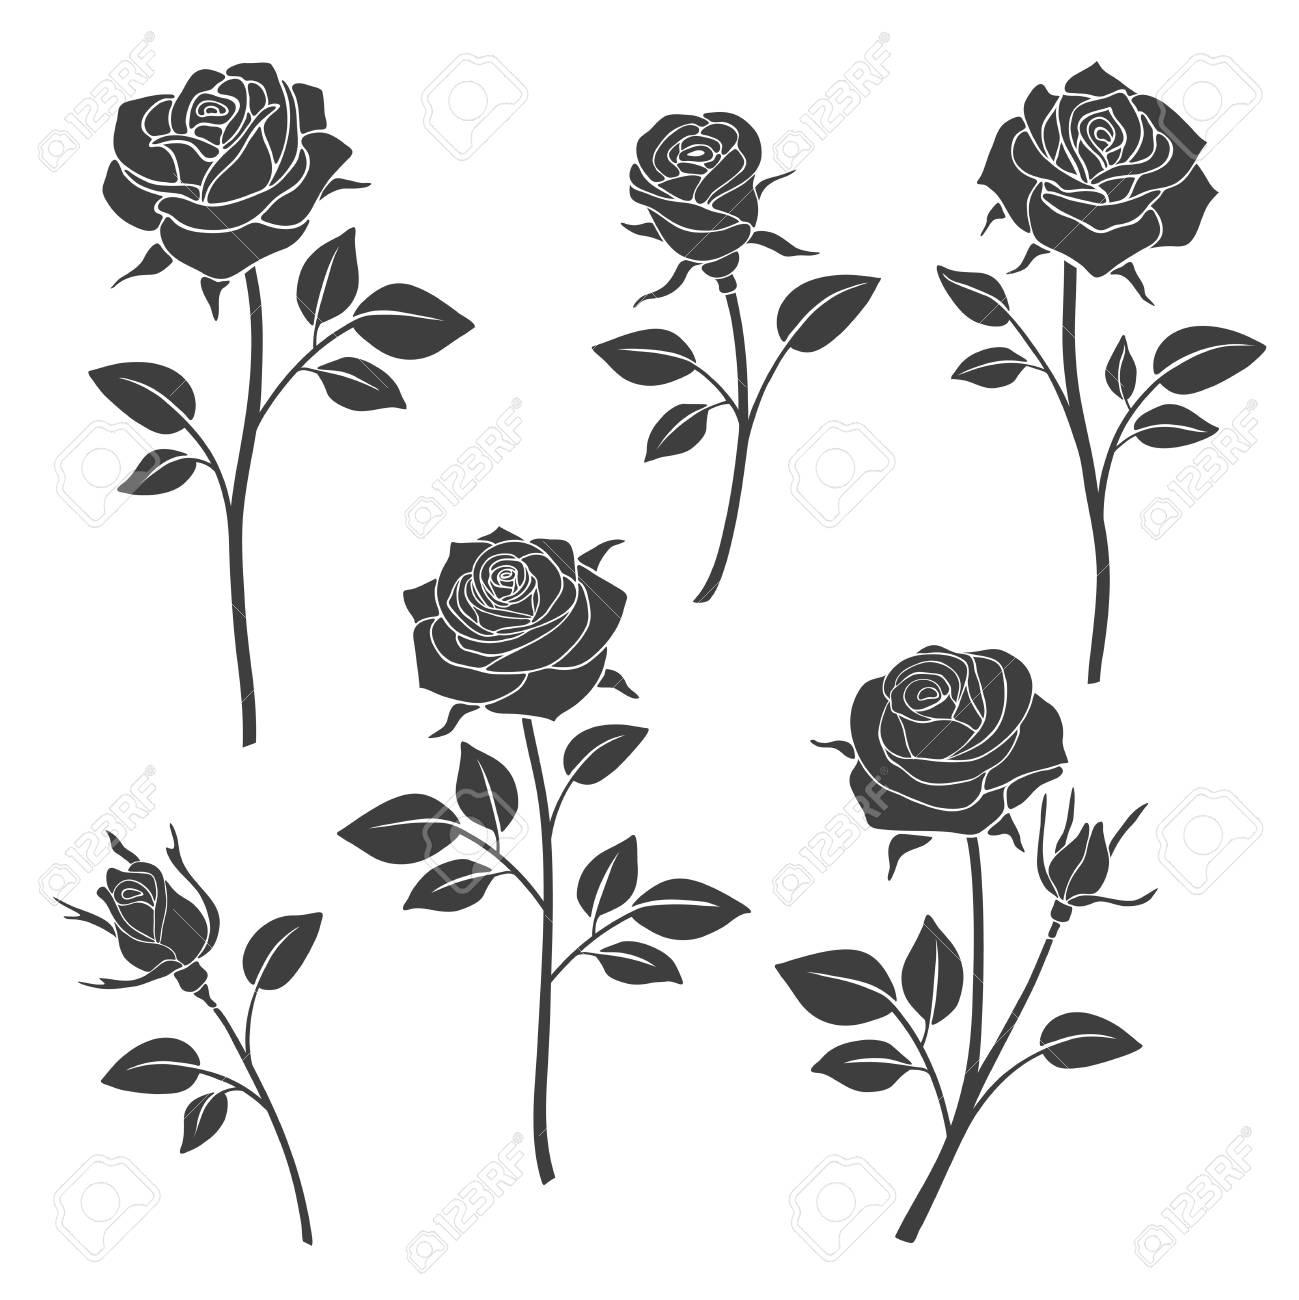 Rose Brotes Vector Siluetas Elementos De Diseño De Flores